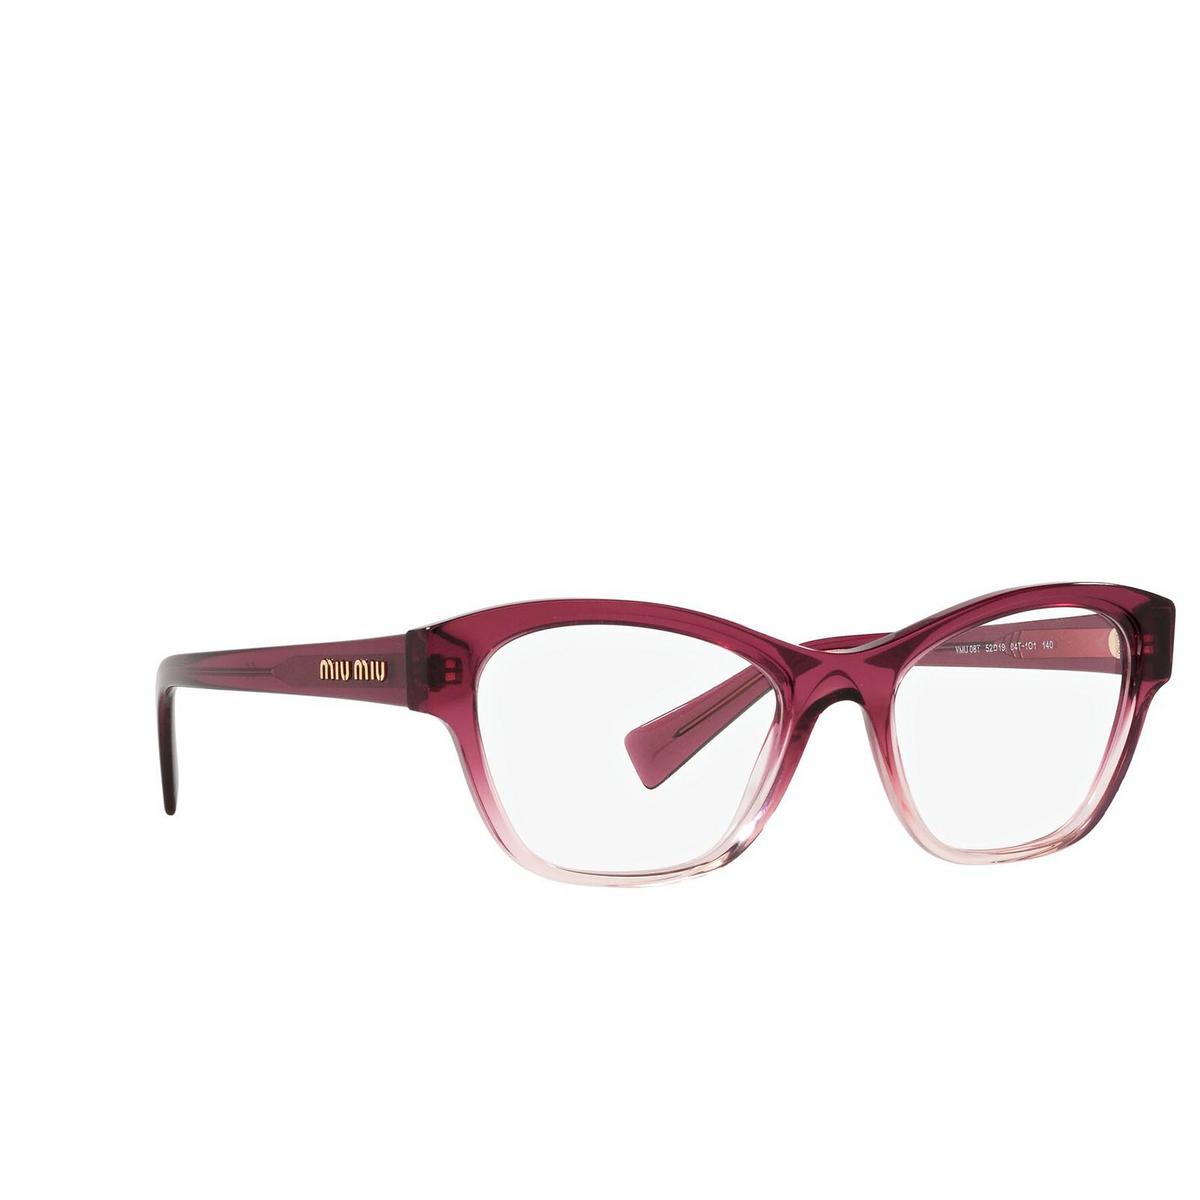 Miu Miu® Irregular Eyeglasses: MU 08TV color Gradient Bordeaux 04T1O1.